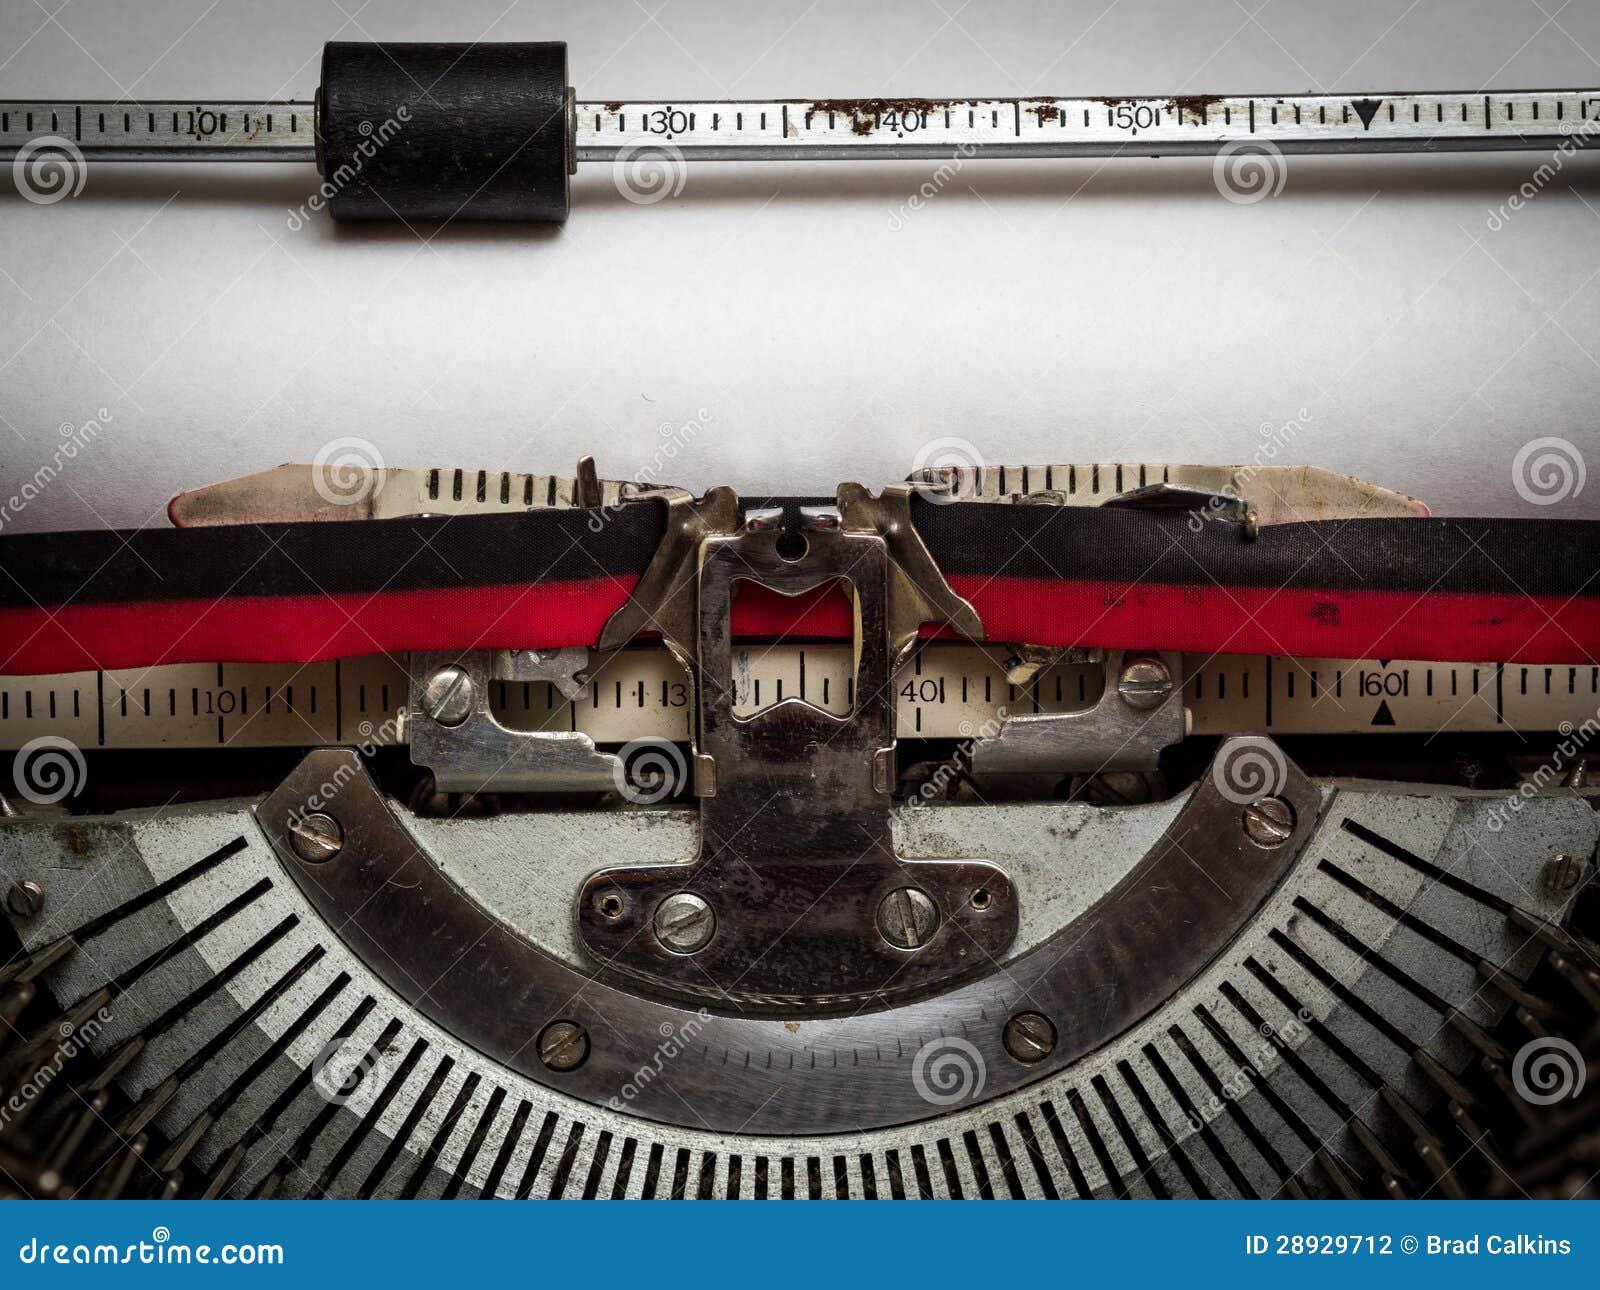 El bloque del programa de escritura